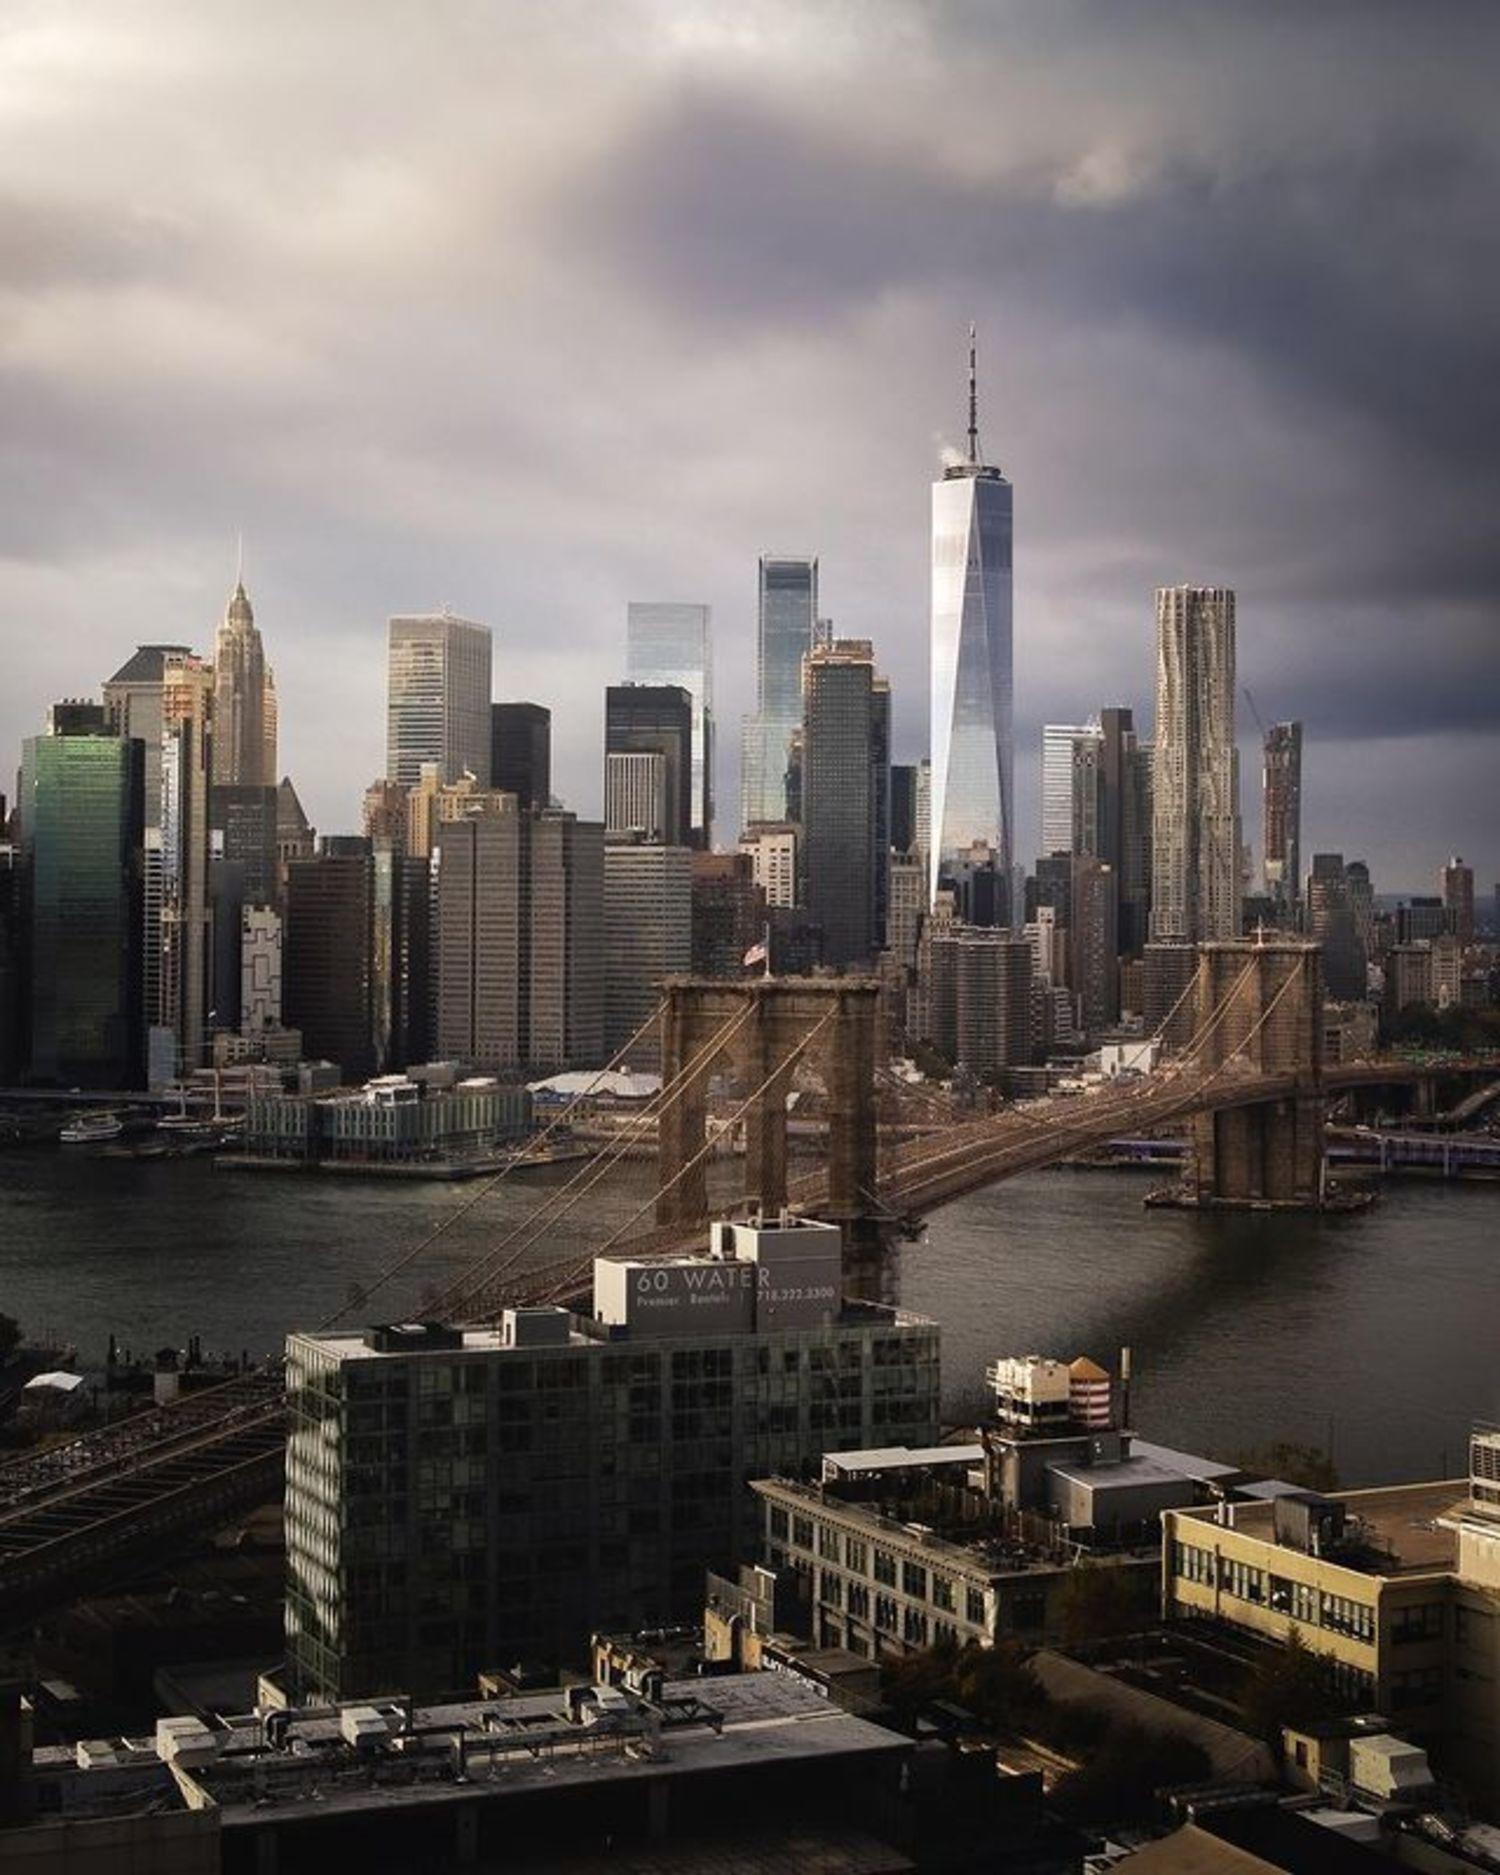 Brooklyn Bridge, East River, and Lower Manhattan from DUMBO, Brooklyn